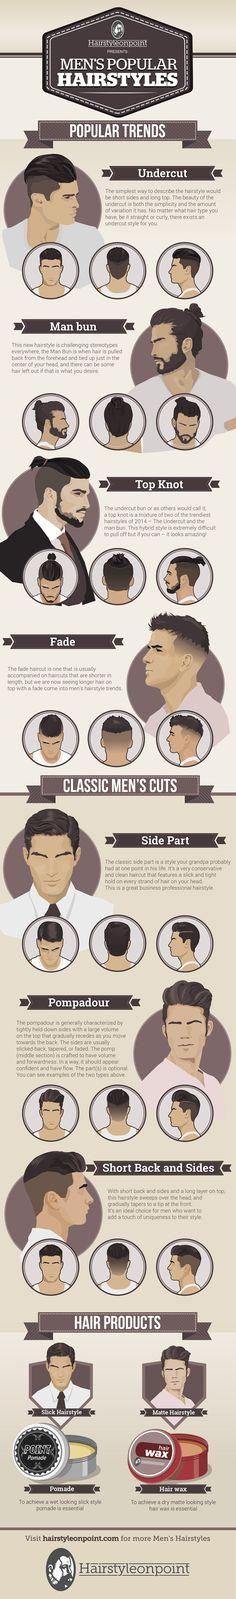 New hair cuts popular haircuts trending hairstyles Ideas Trendy Mens Haircuts, Popular Hairstyles, Trendy Hairstyles, Bun Hairstyles, Boy Haircuts, Modern Haircuts, Short Haircuts, Hairstyle Ideas, Wedding Hairstyles